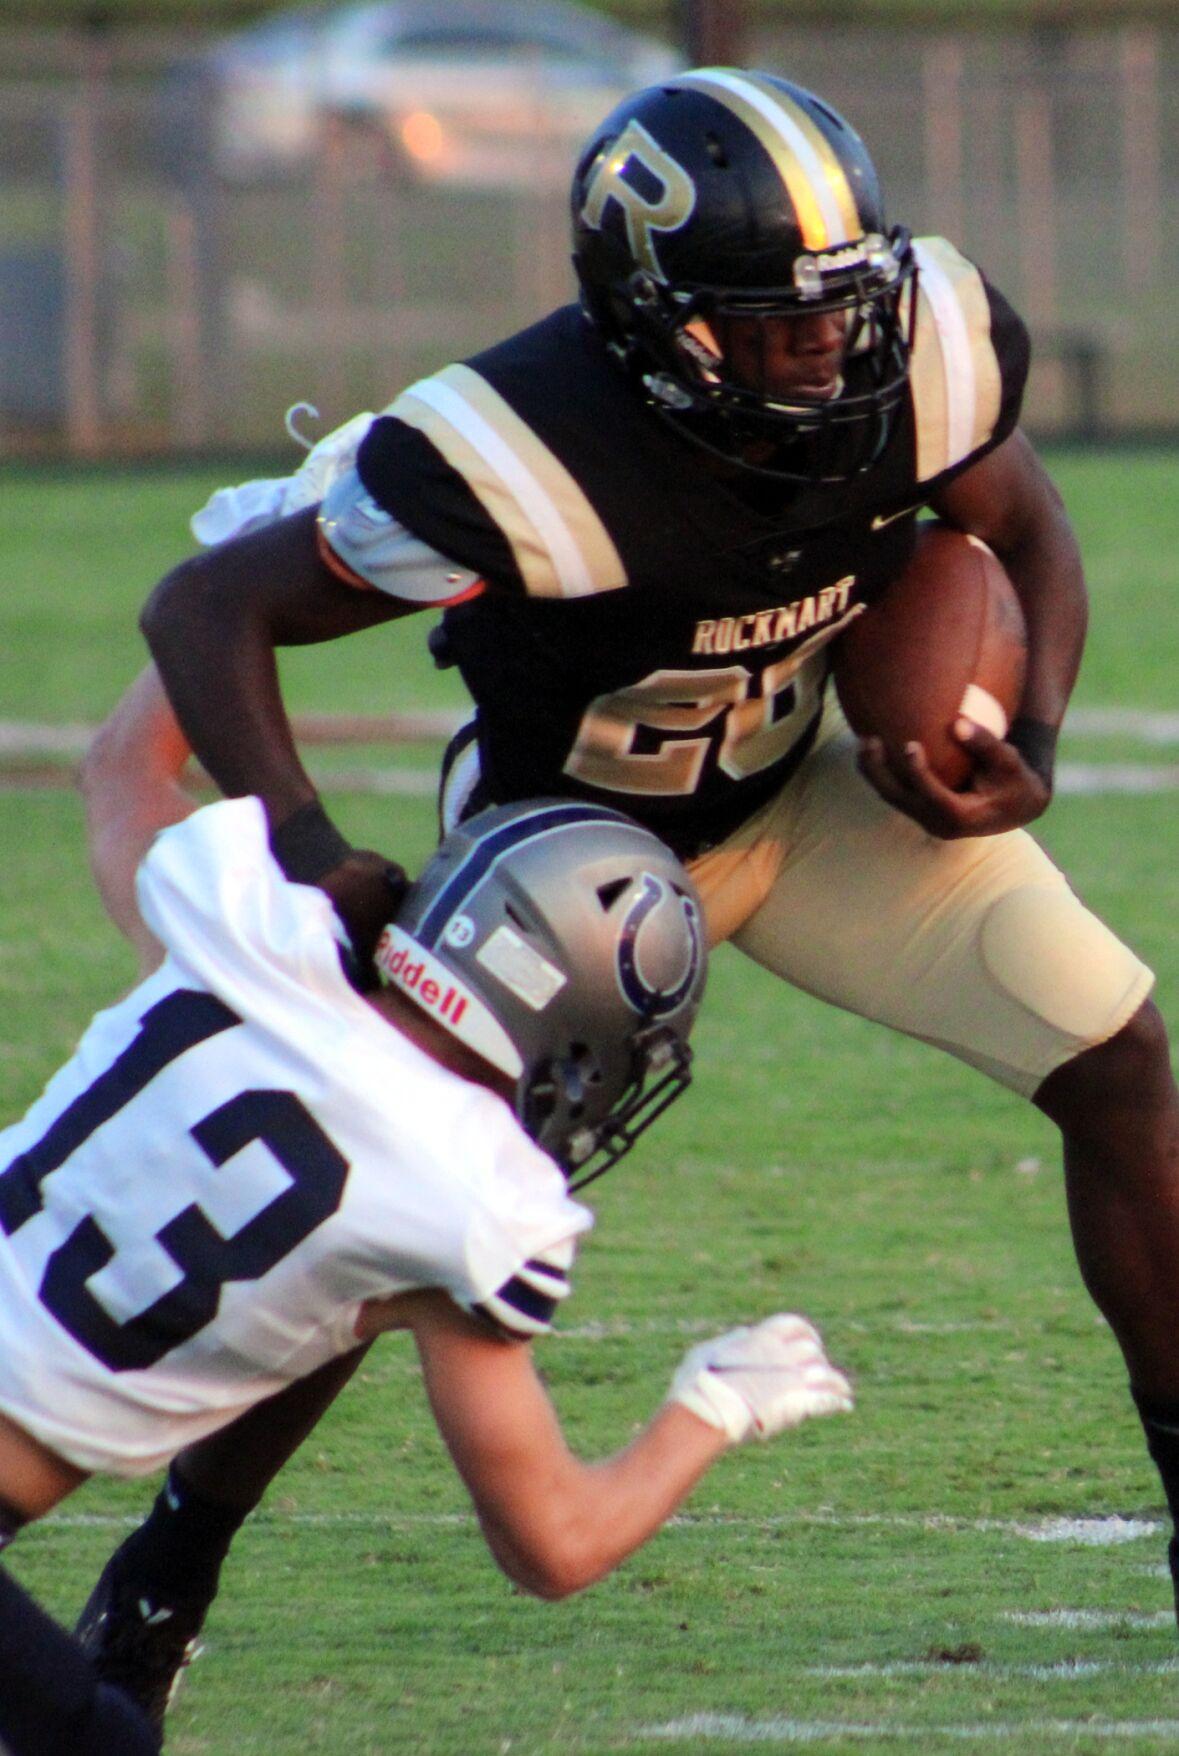 Rockmart thrashes Colts in region opener